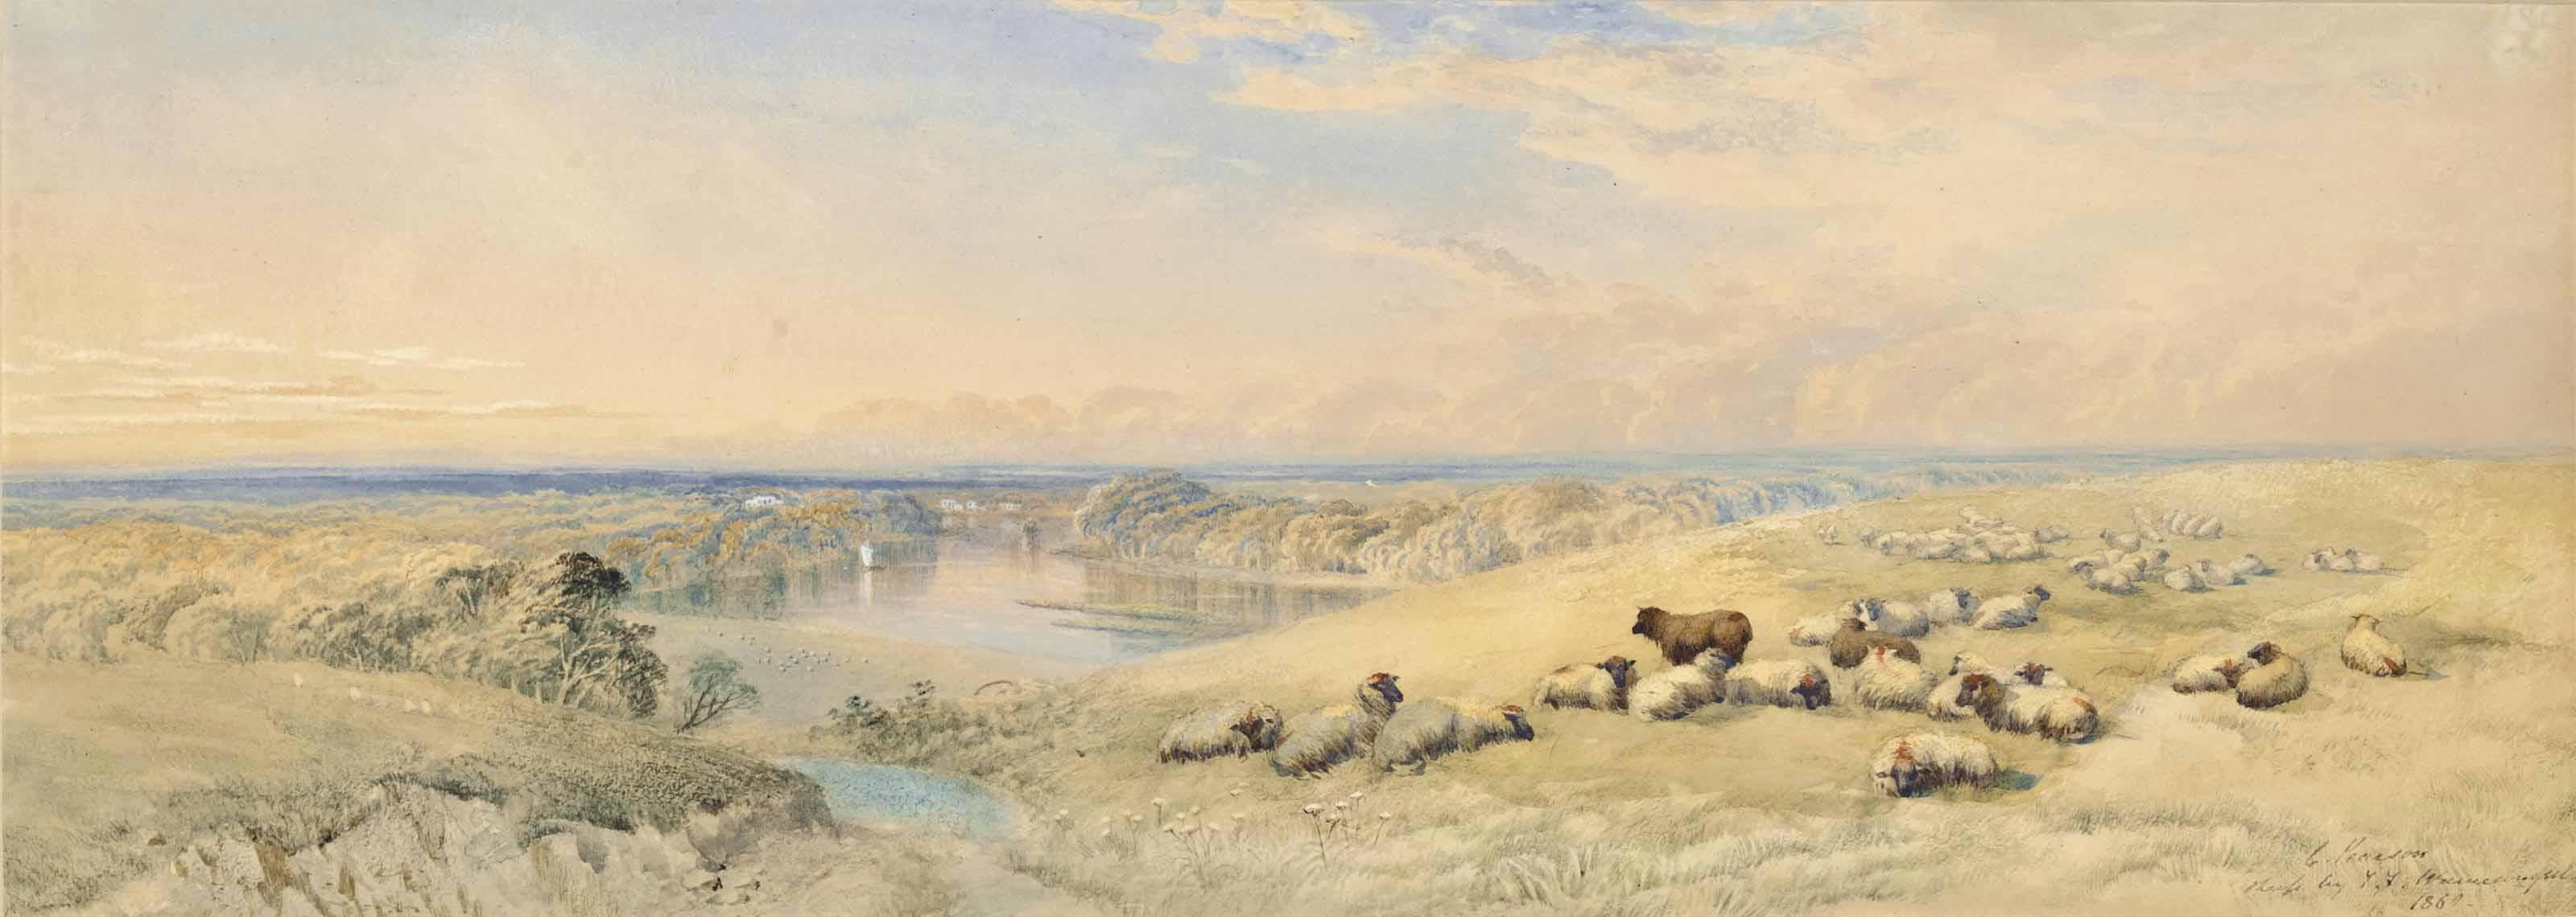 Sheep resting on a hillside, a river beyond